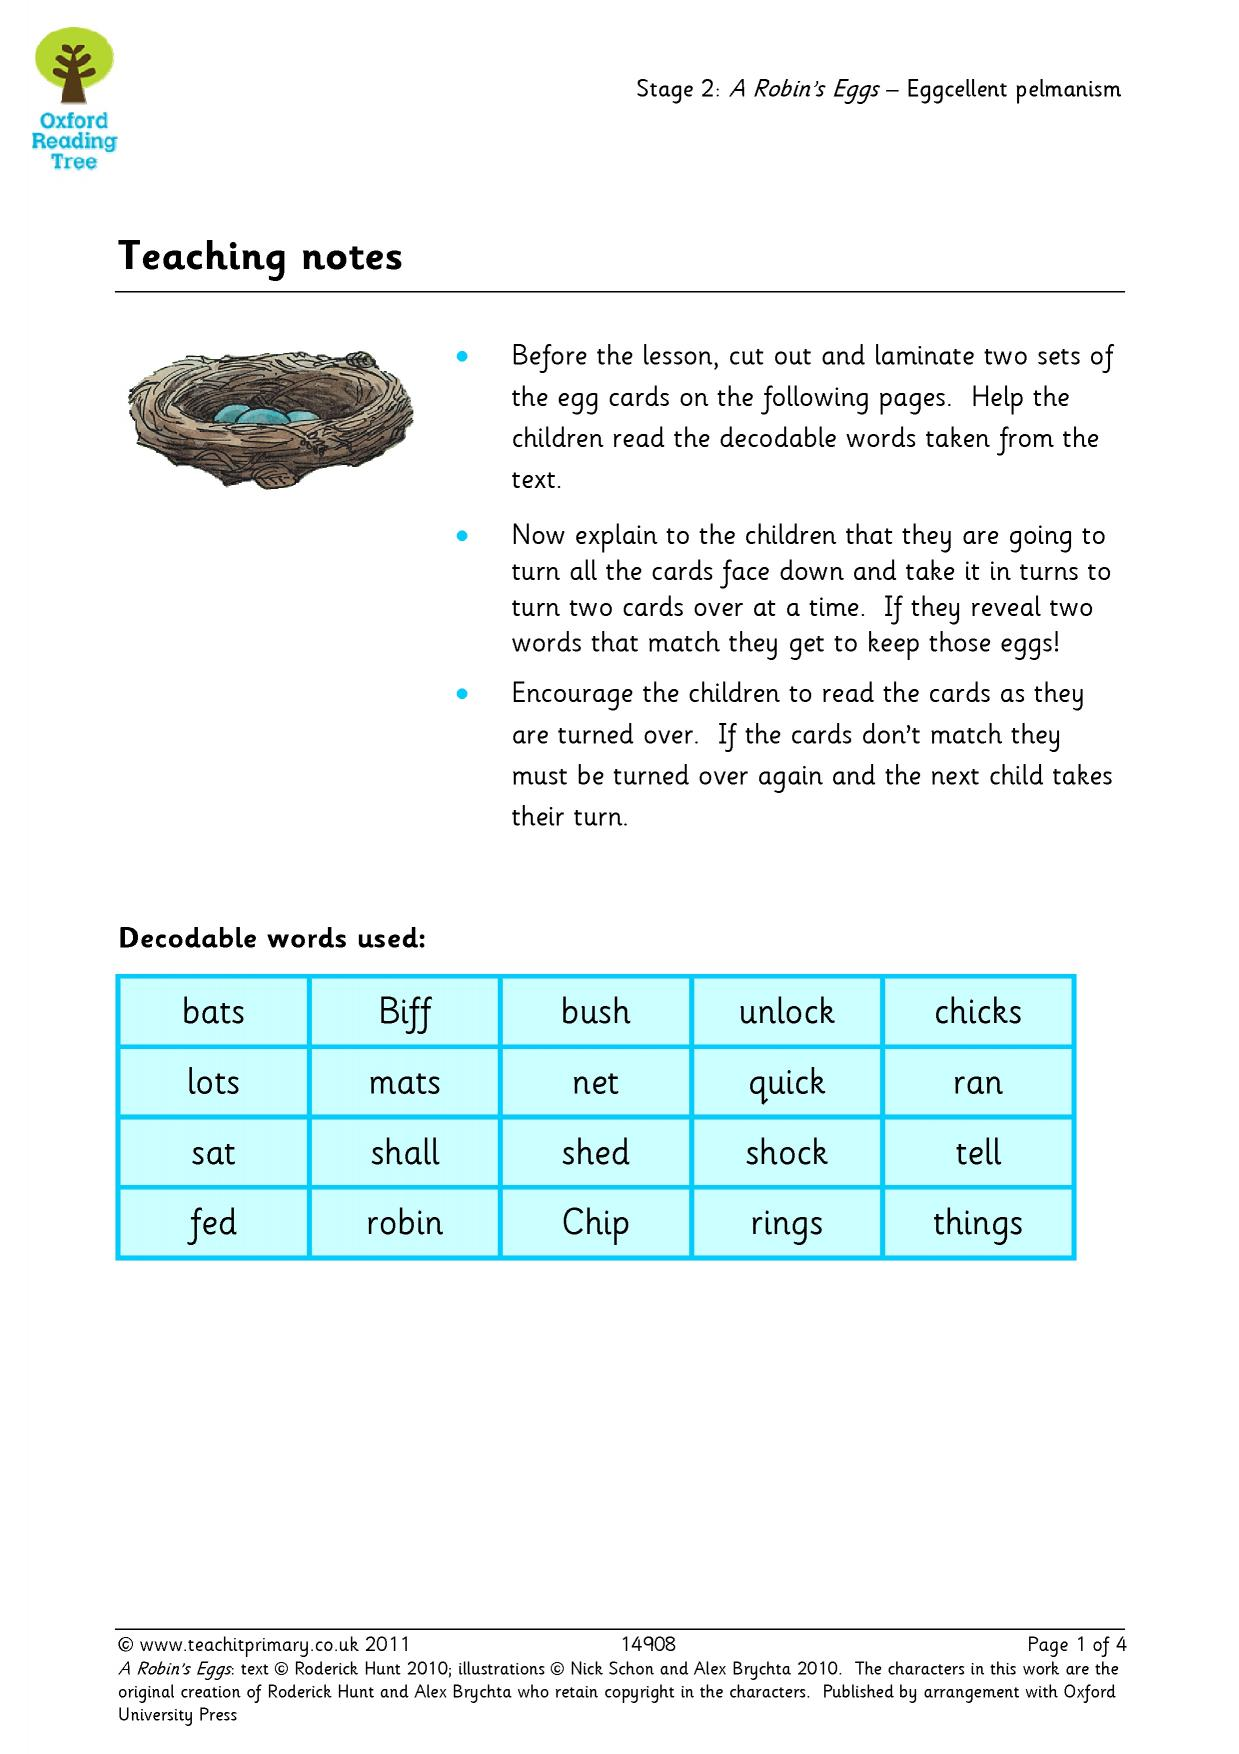 Oxford Reading Tree resources - Teachit Primary - Oxford Reading ...